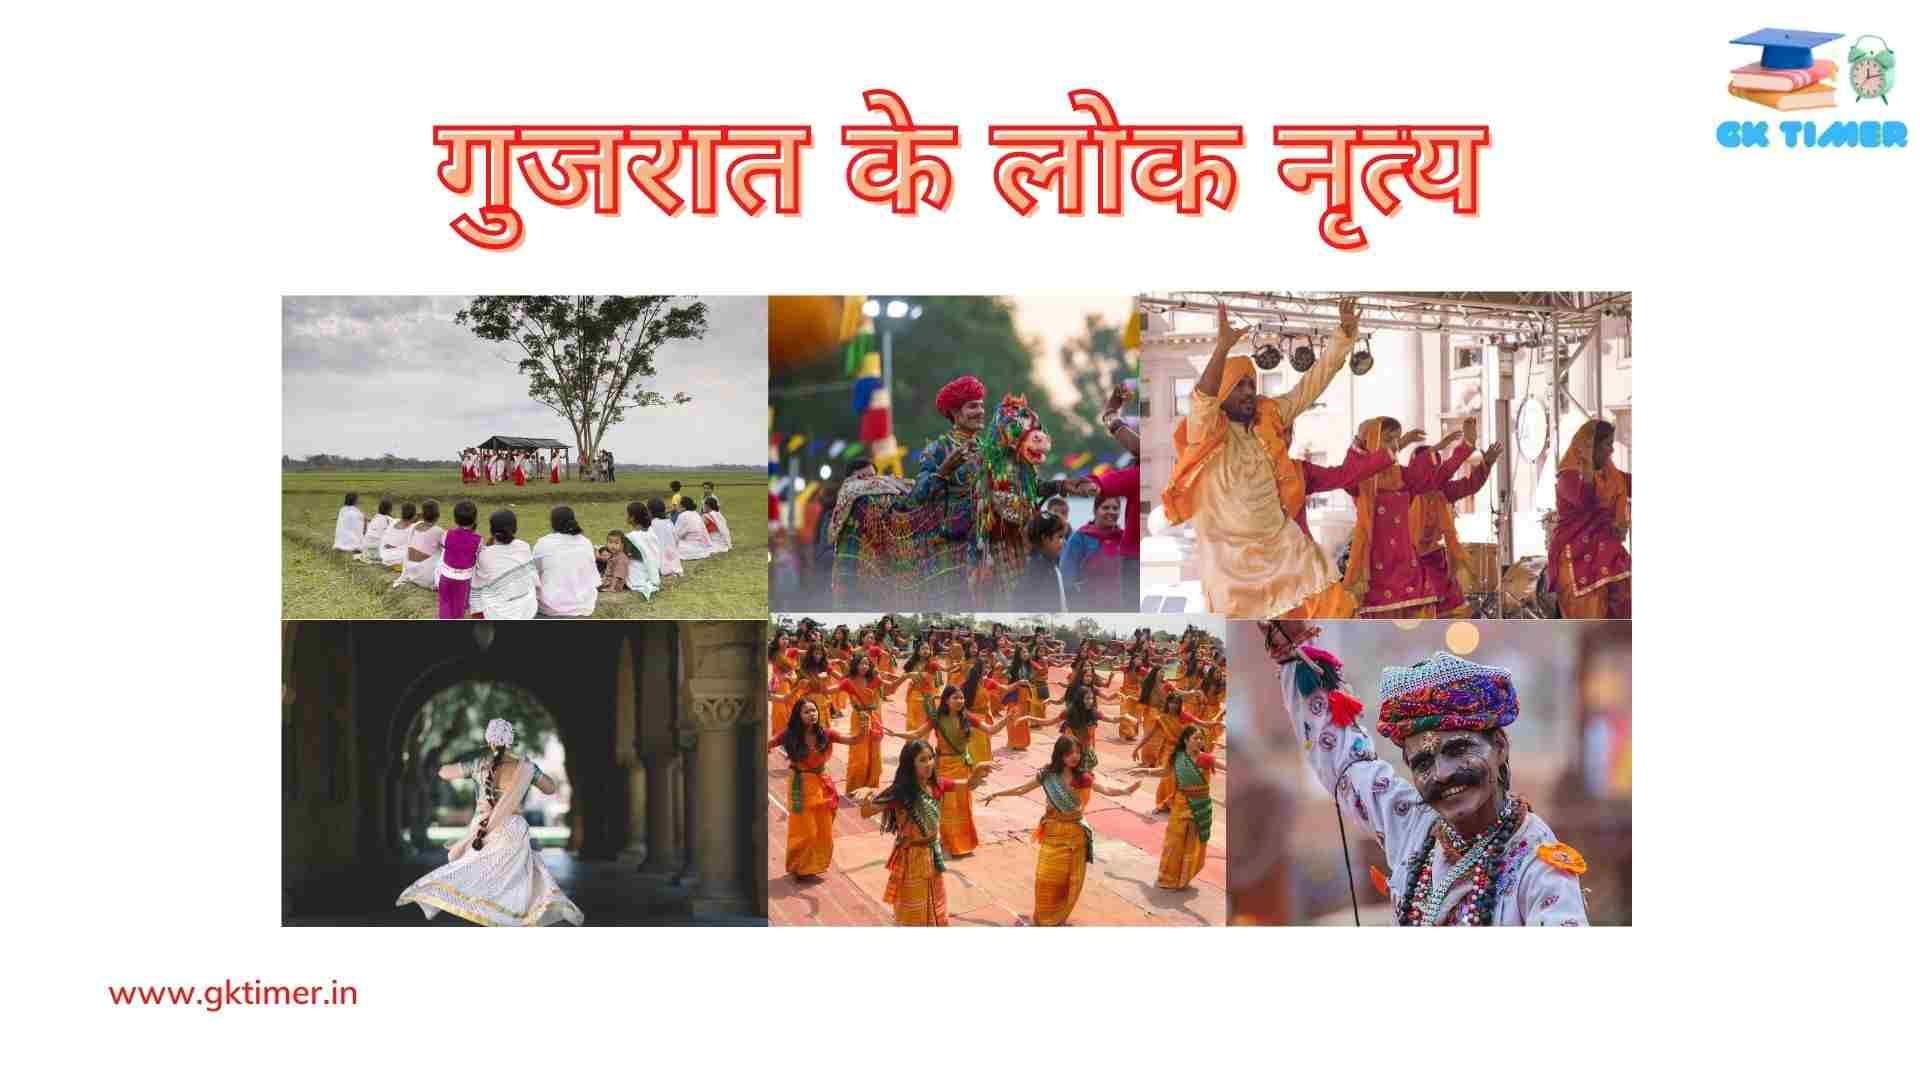 गुजरात के लोकप्रिय लोक नृत्य(भवई, डांडिया, गरबा, पधार, टिप्पनी)   Popular folk dances of Gujarat in Hindi